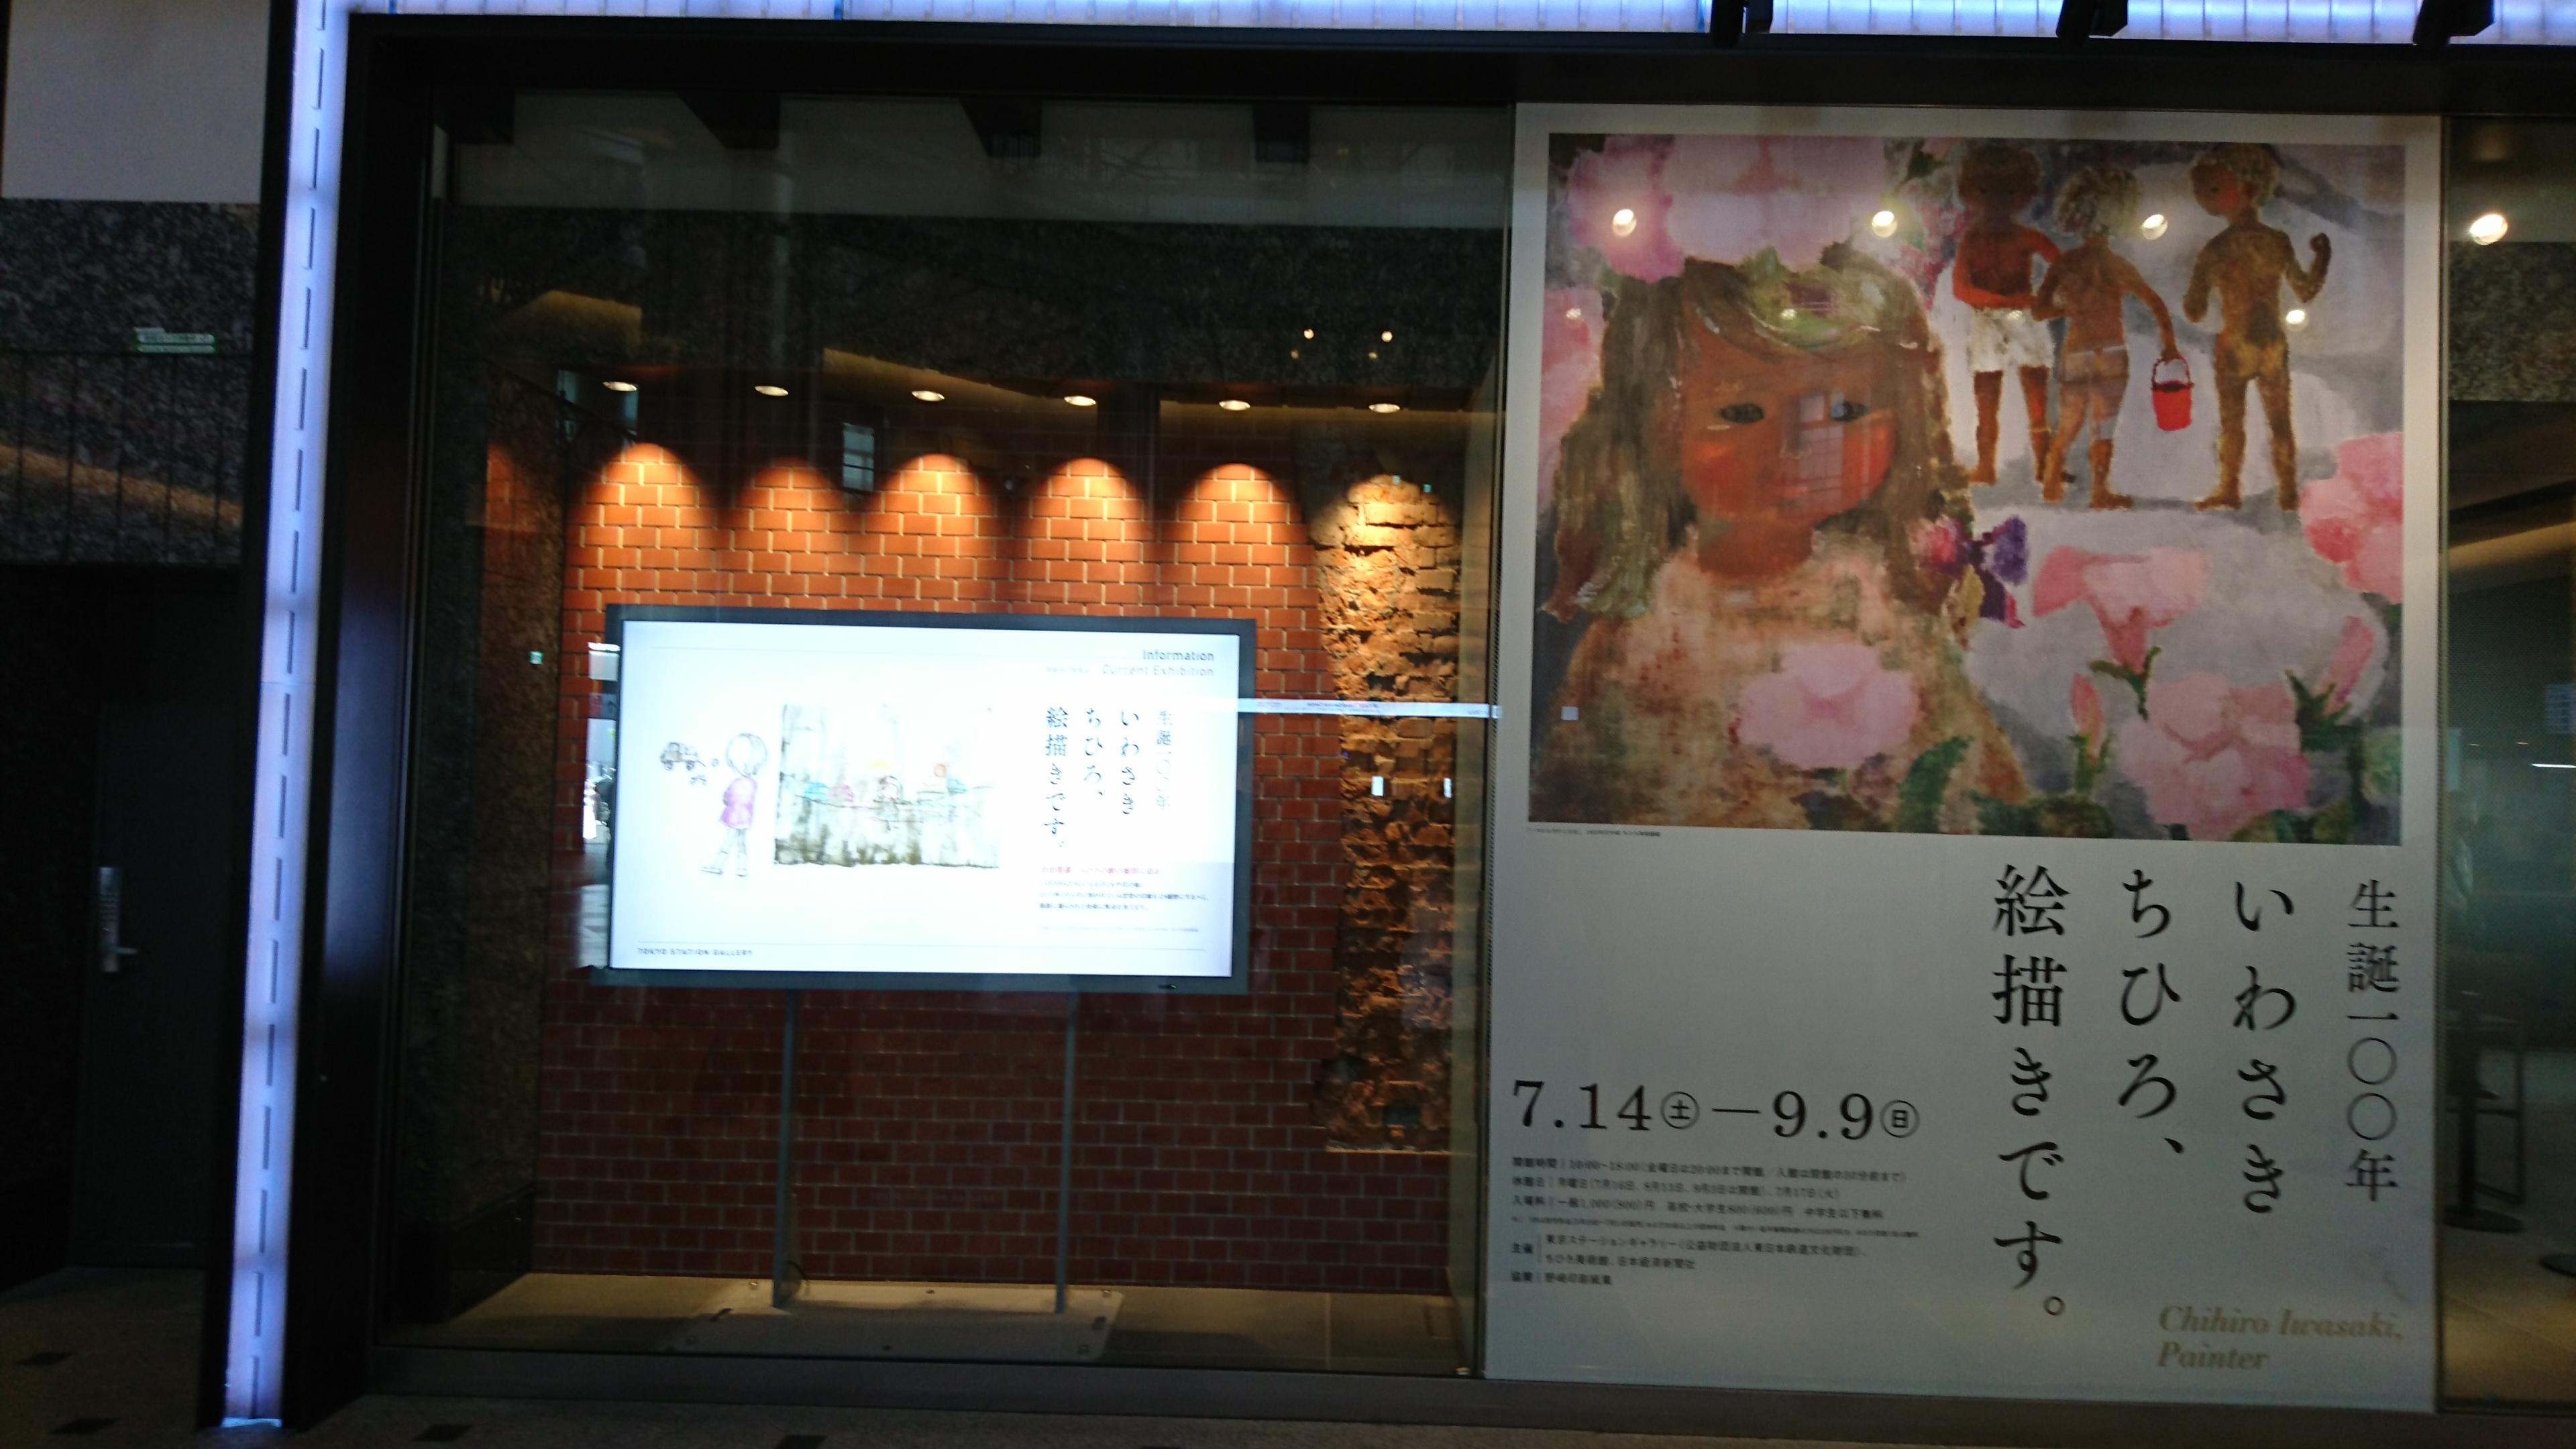 http://www.inoue-satoshi.com/diary/DSC_0850.JPG